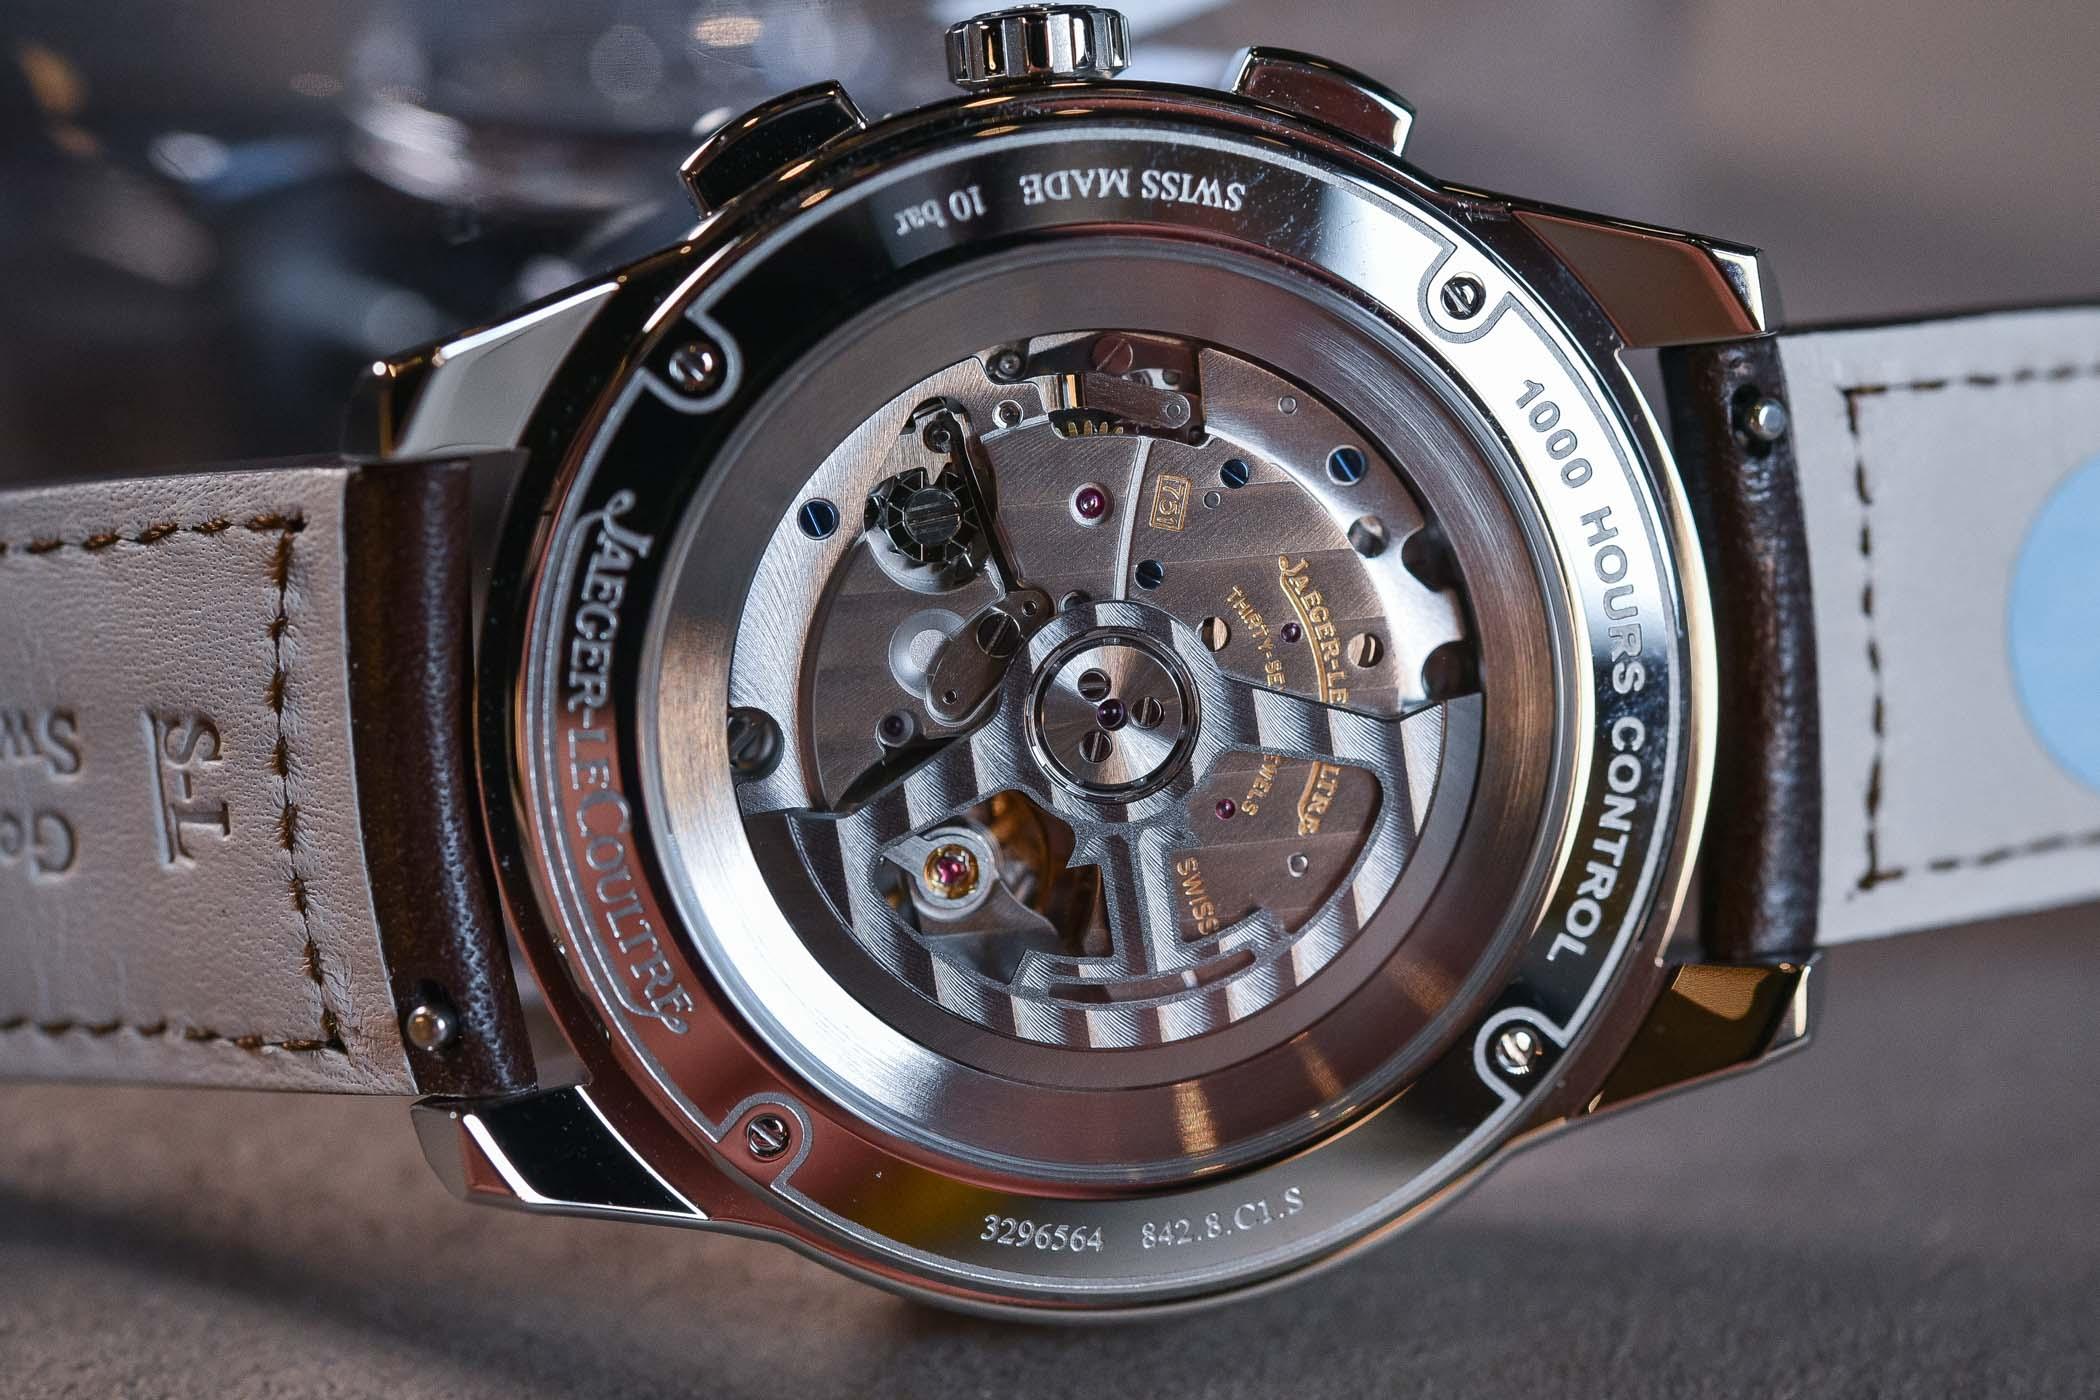 Jaeger-LeCoultre Polaris Chronograph 42mm